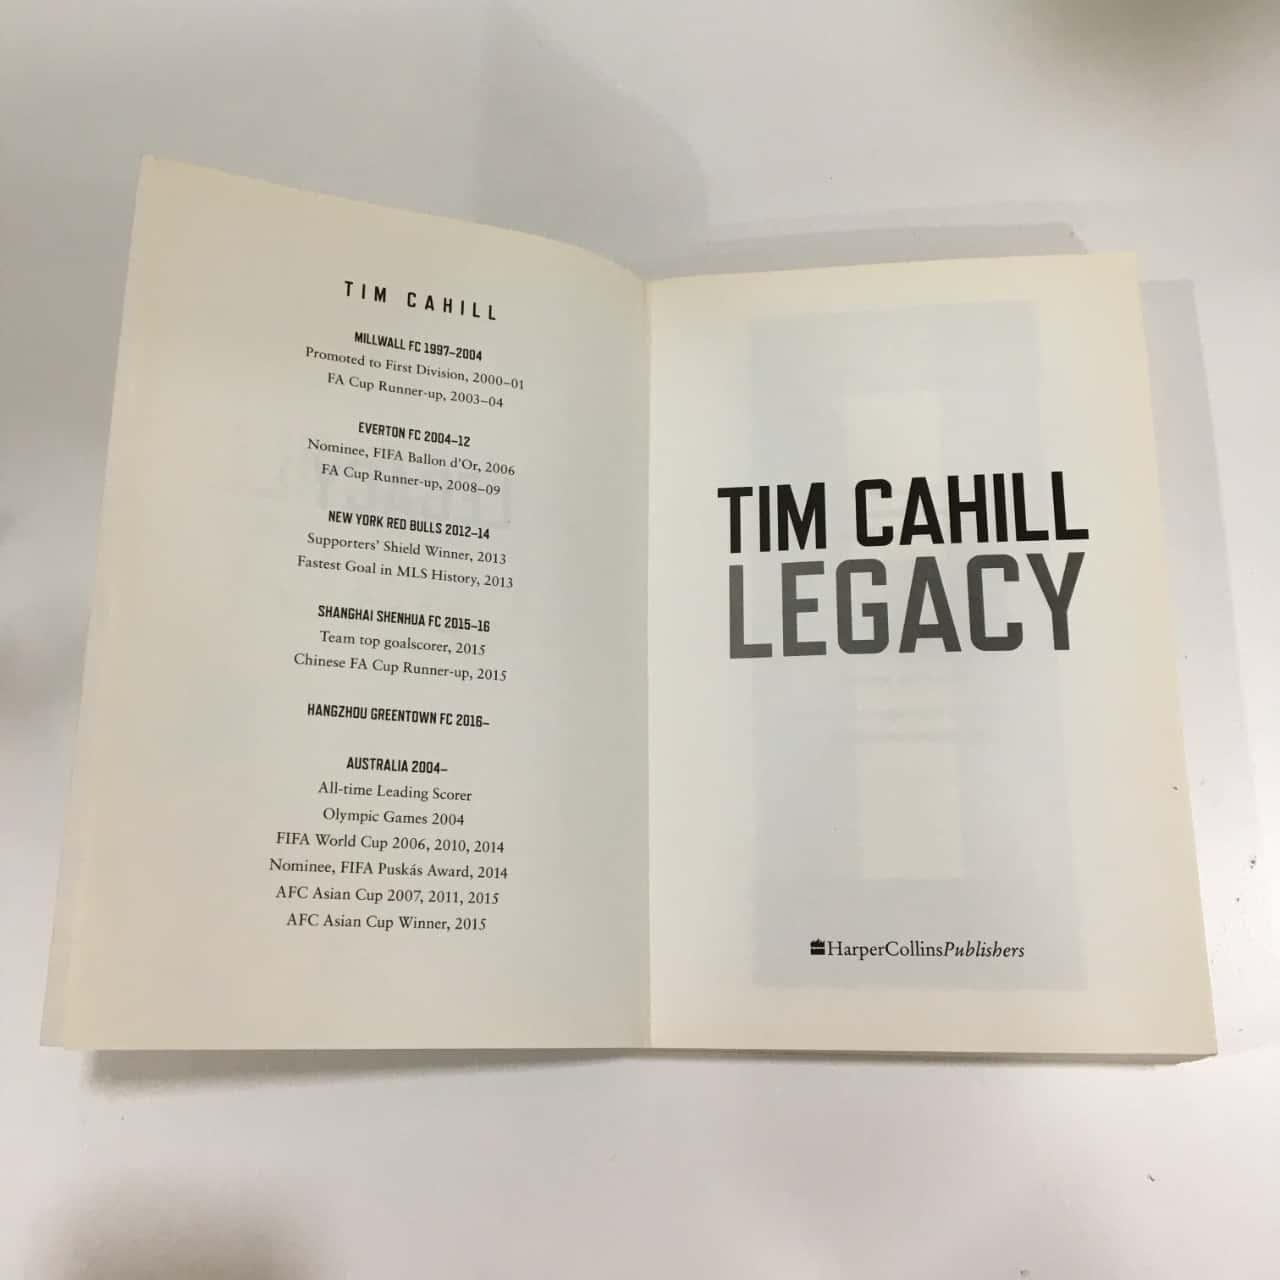 Tim Cahill Legacy